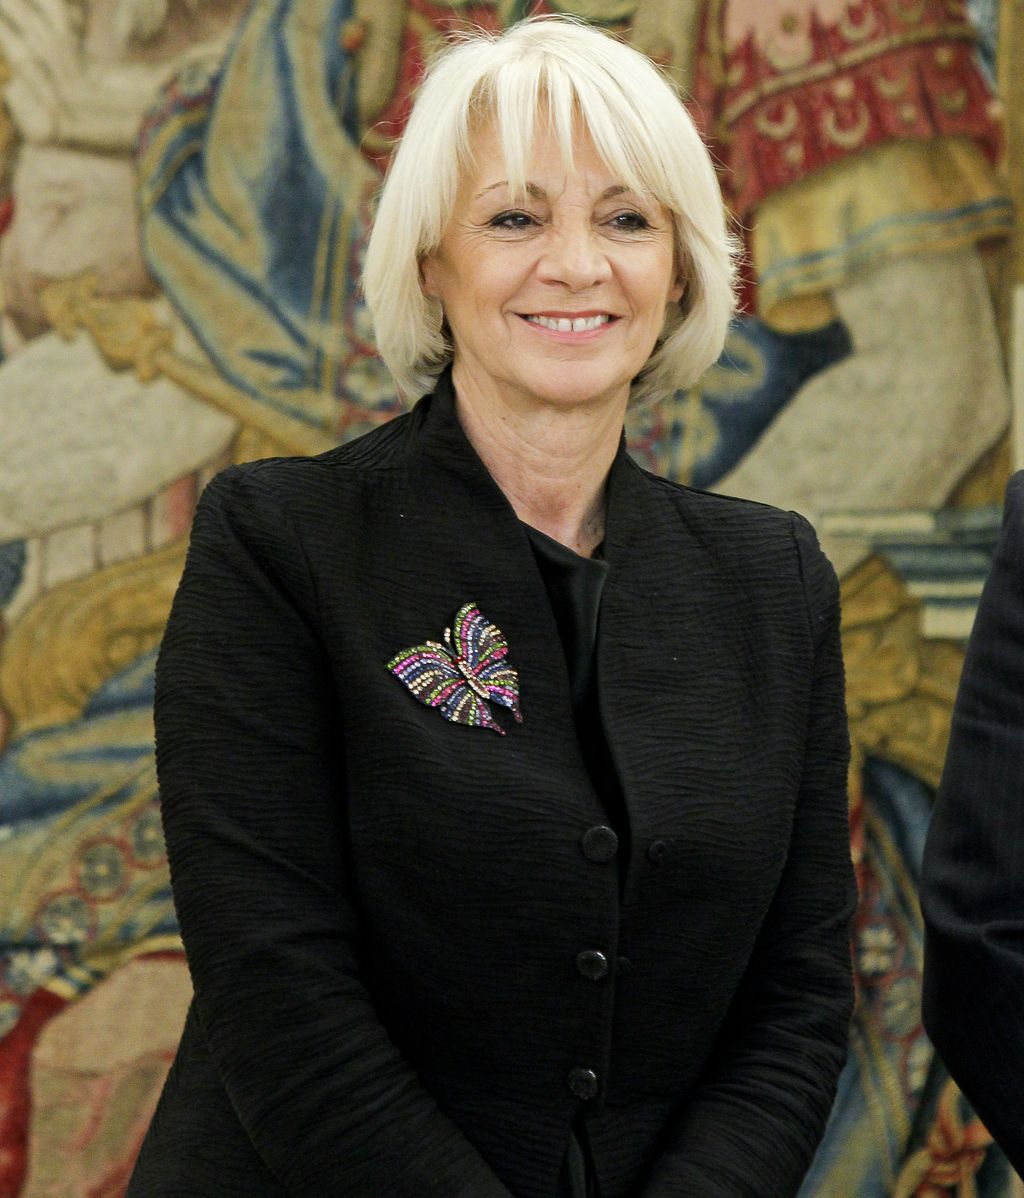 Teófila Martínez, la alcaldesa de Cádiz